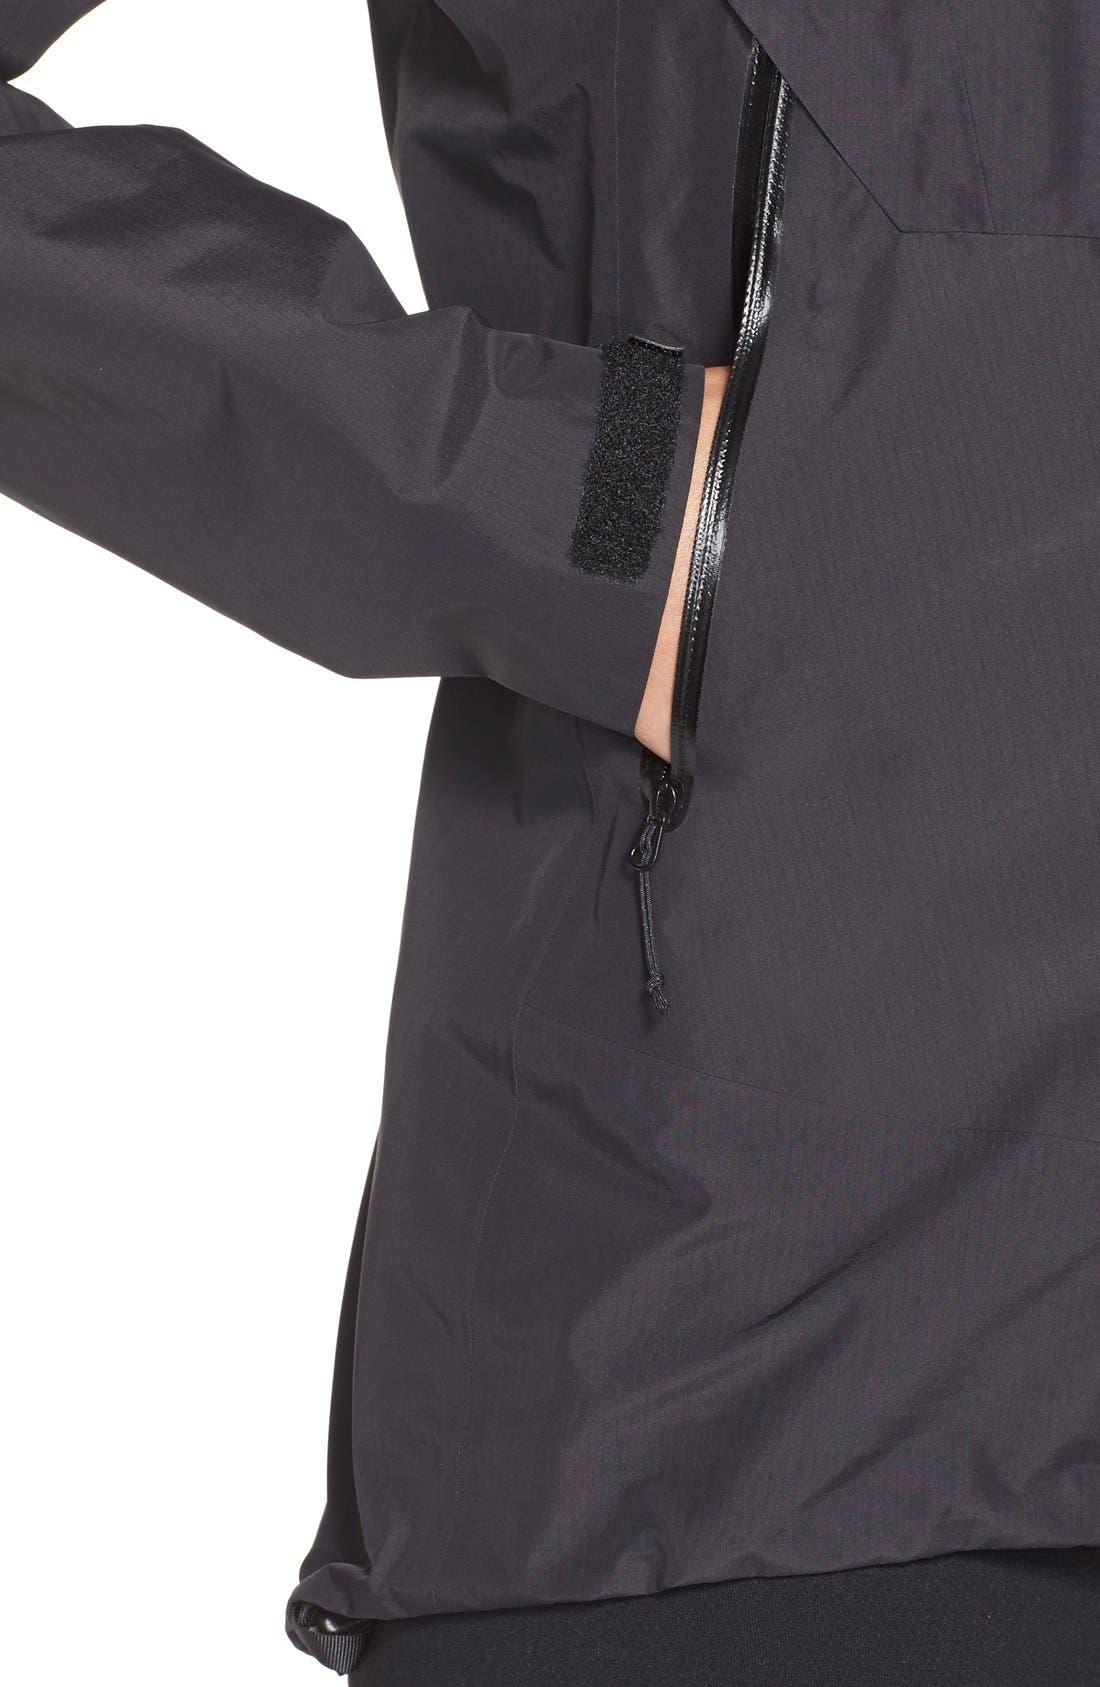 'Beta SL' Waterproof Jacket,                             Alternate thumbnail 4, color,                             001